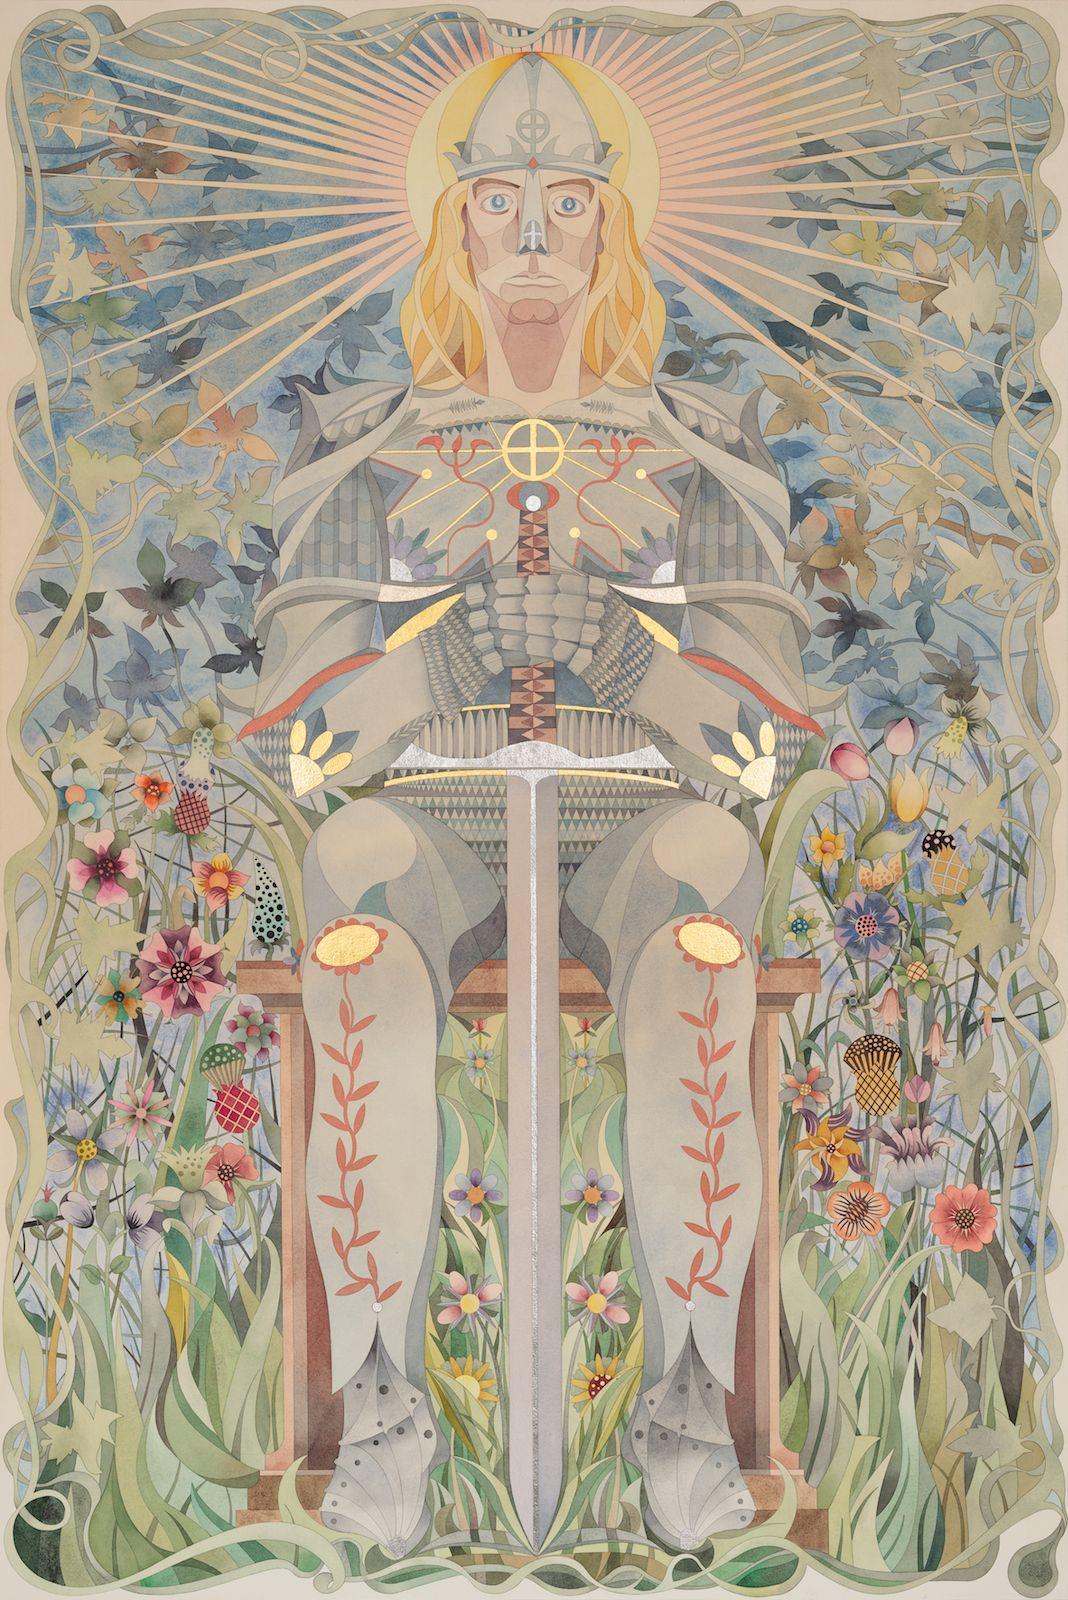 Der Menschheits Representant, 2013, watercolour, gold-leaf and palladium leaf on paper, 50 x 100 cm